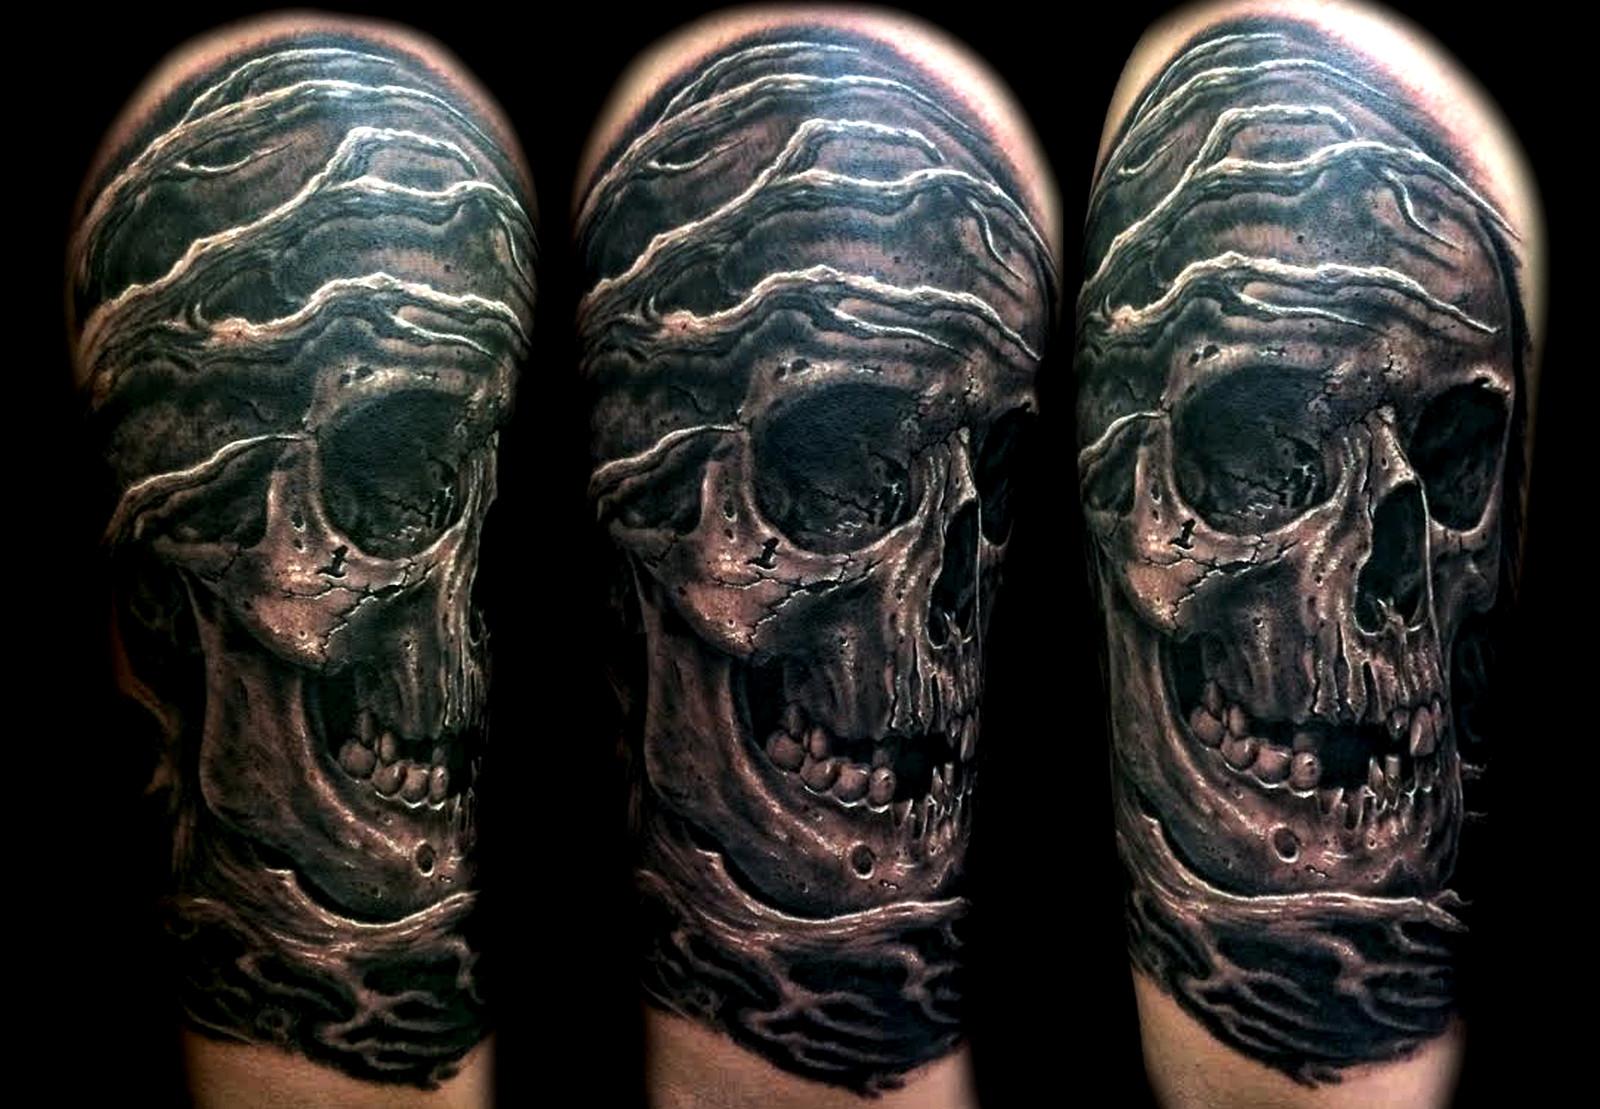 Skull tattoo las vegas best tattoo shops artists hesderson for Tattoo shops in henderson